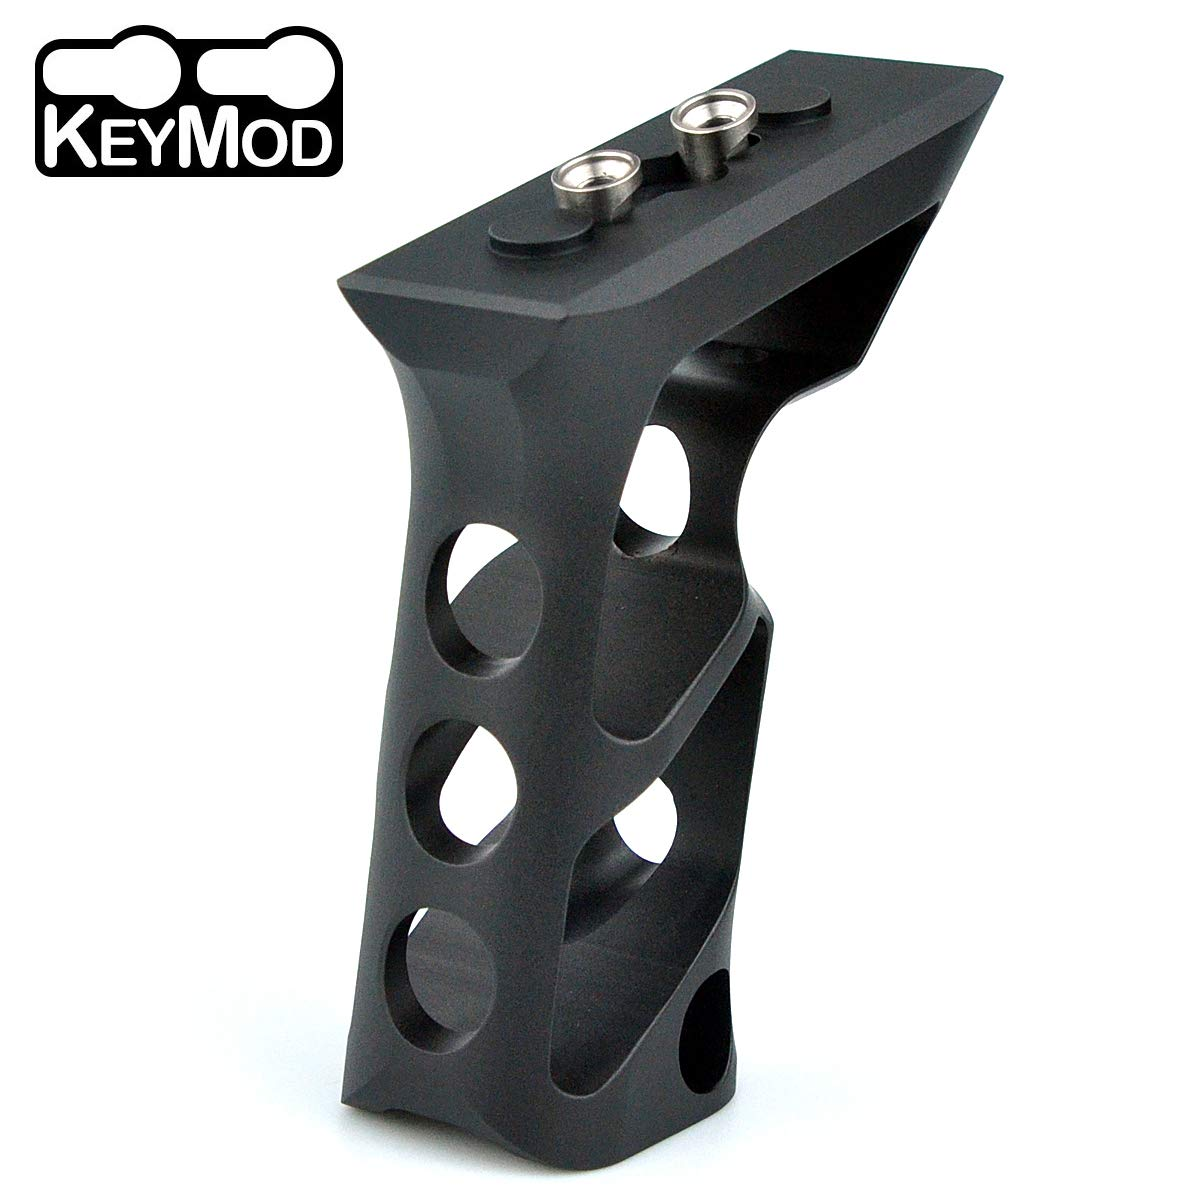 Aluminum Keymod Picatinny Rail Section Accessories for Key Mod System by SJK